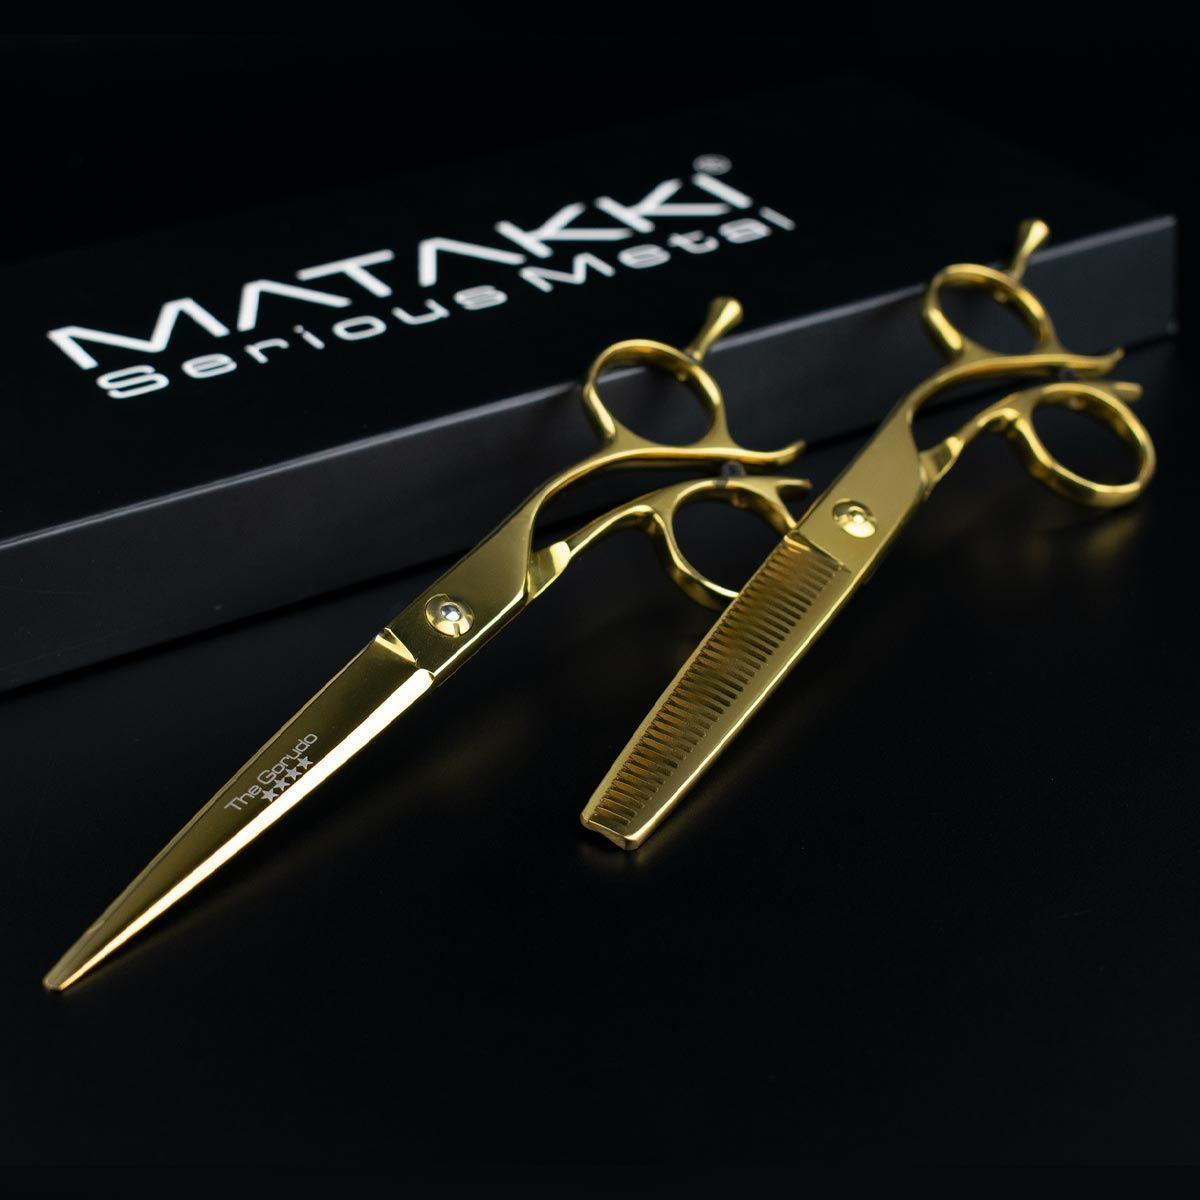 Picture of MATAKKI Gorudo Professional Hair Cutting Scissor Set 5.5/6.0 Inches - Ex Demo